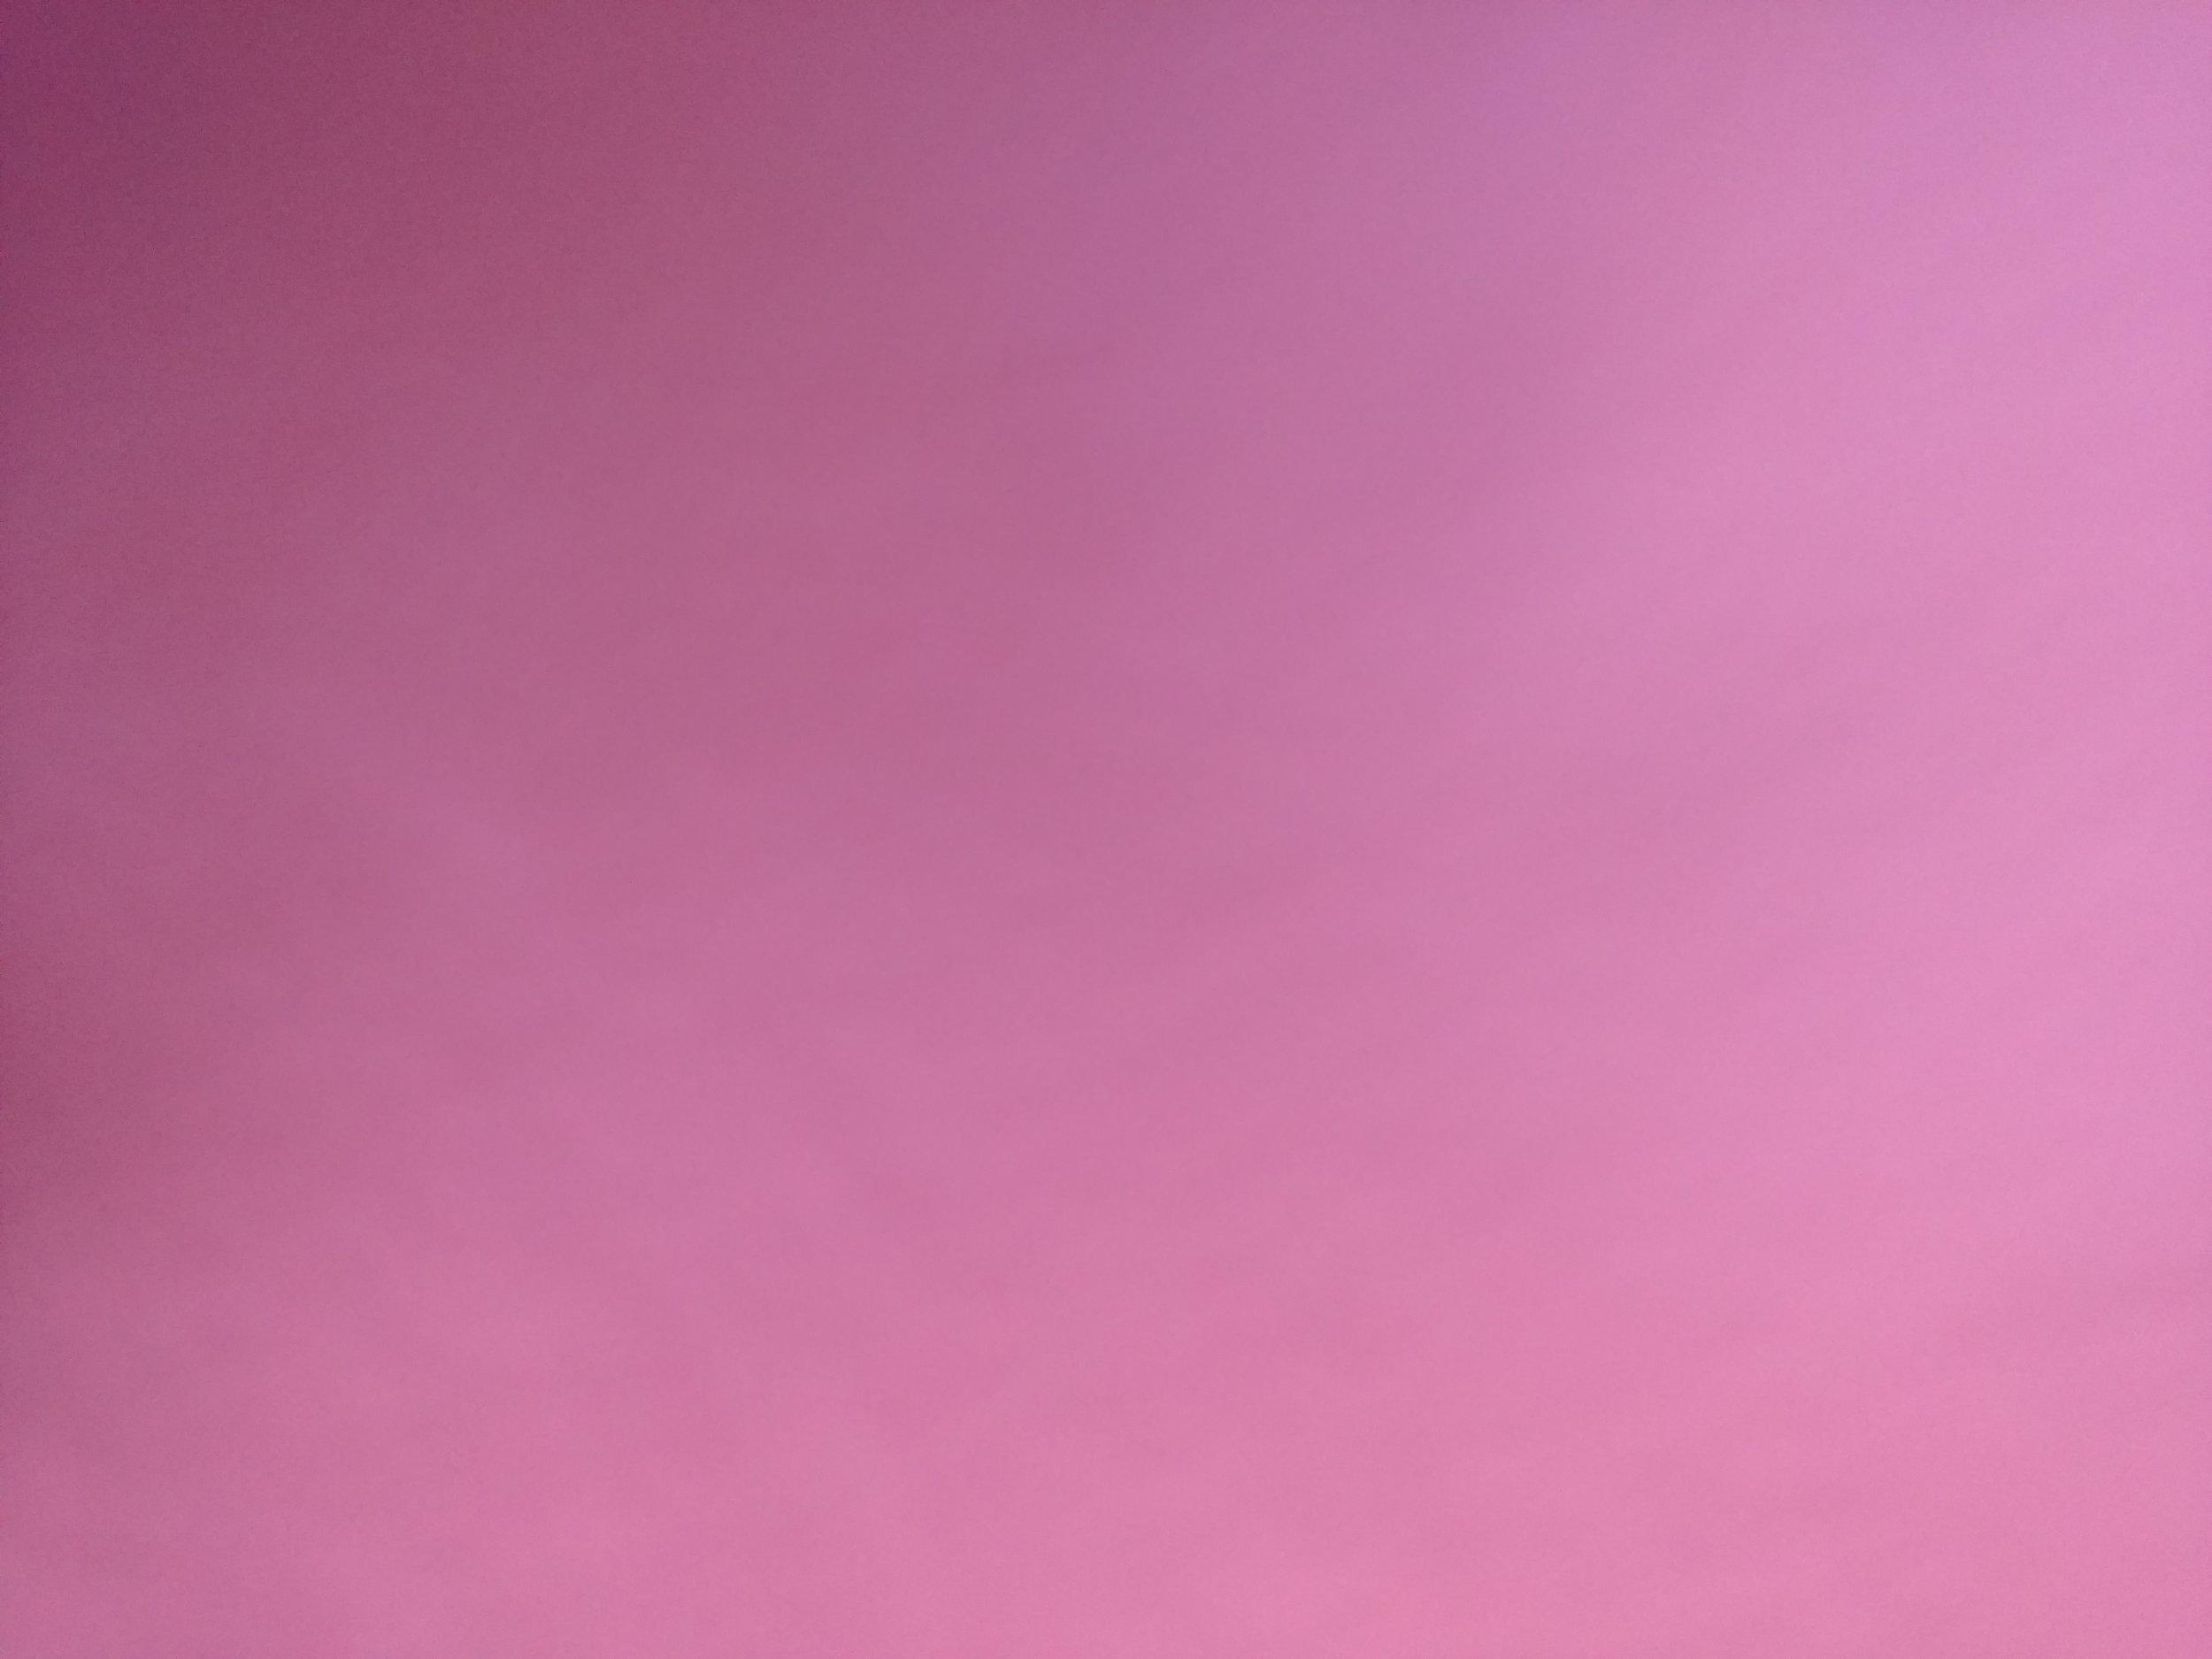 willroth-co-free-texture-gradient-097.jpg